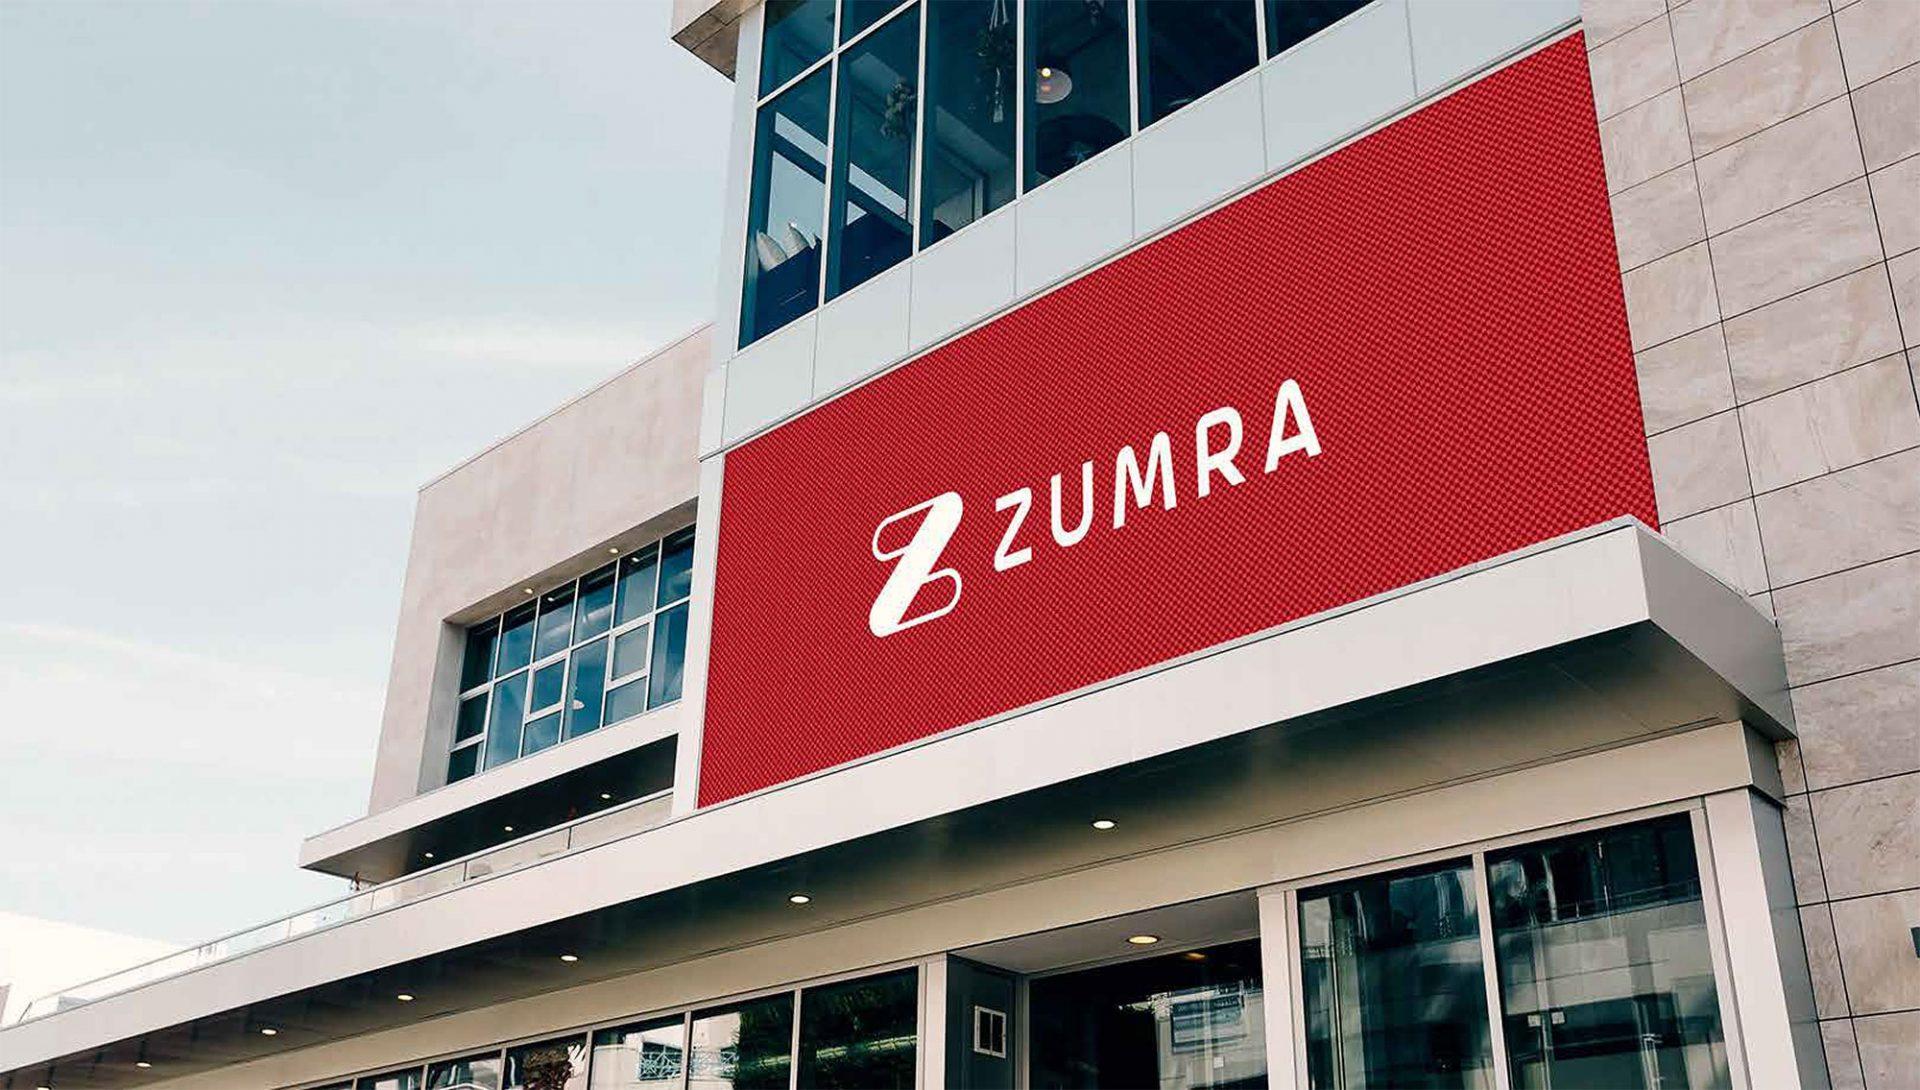 Zumra – Complete the Look! Branding Mockup